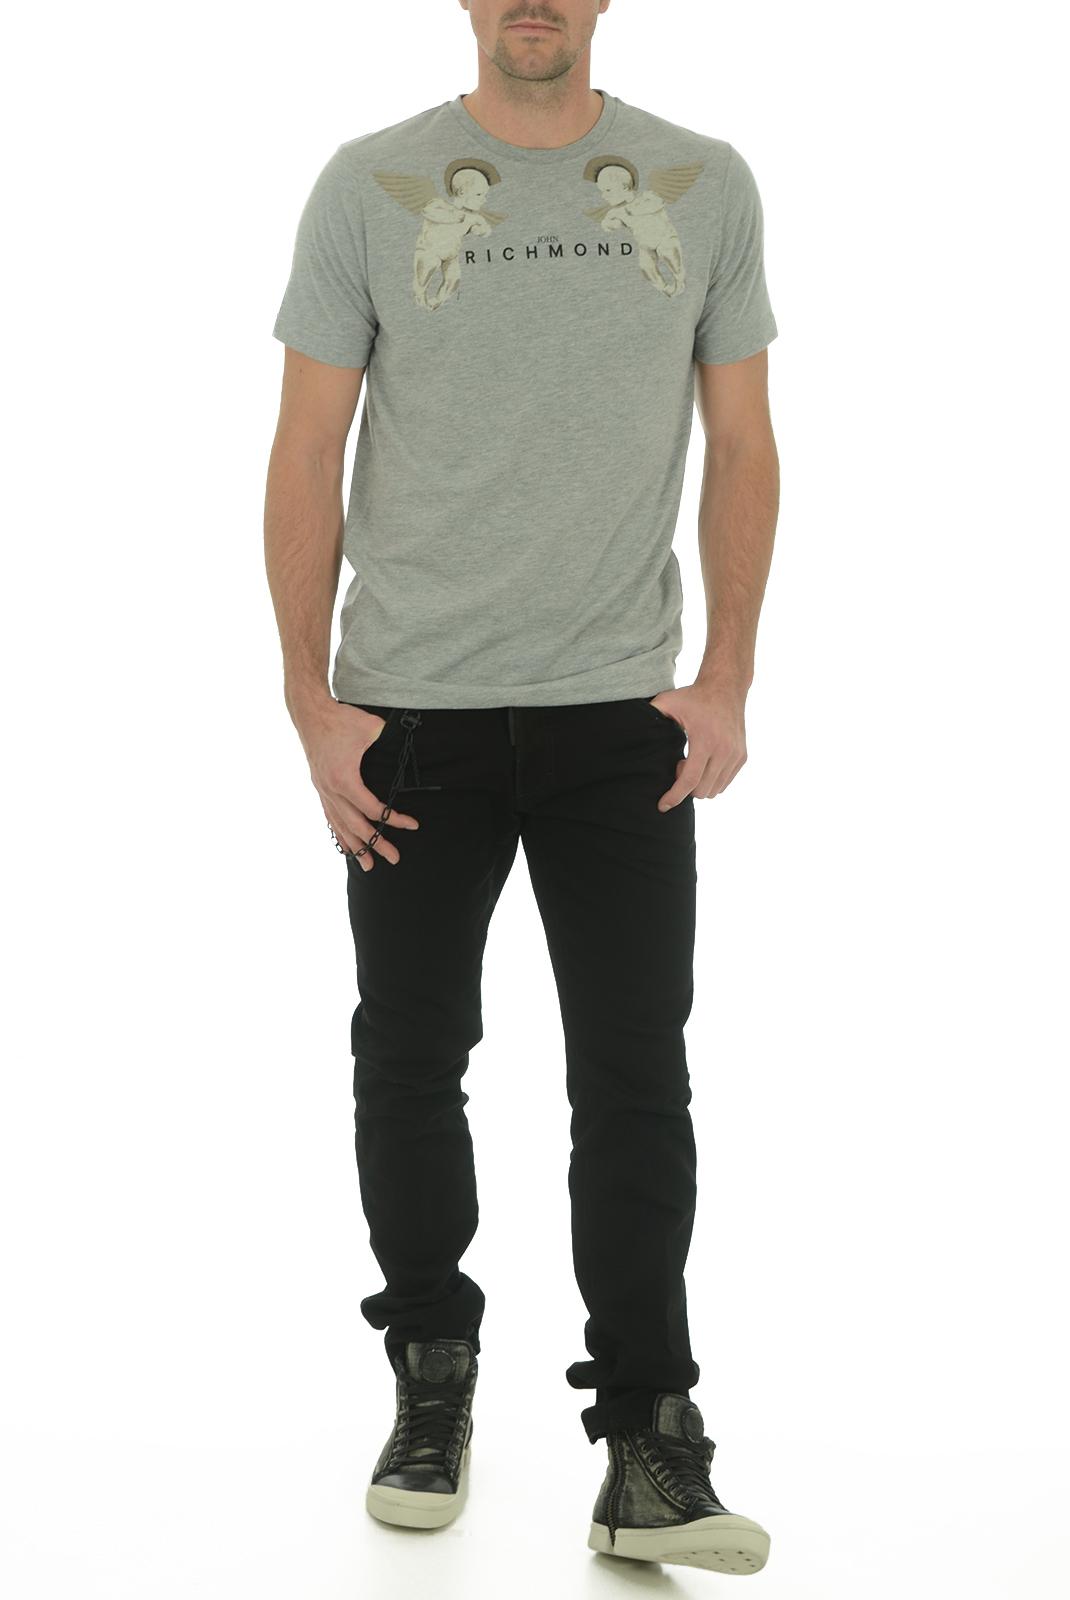 Tee-shirts  John richmond SATUBINA W0066 GRIGIO MEL